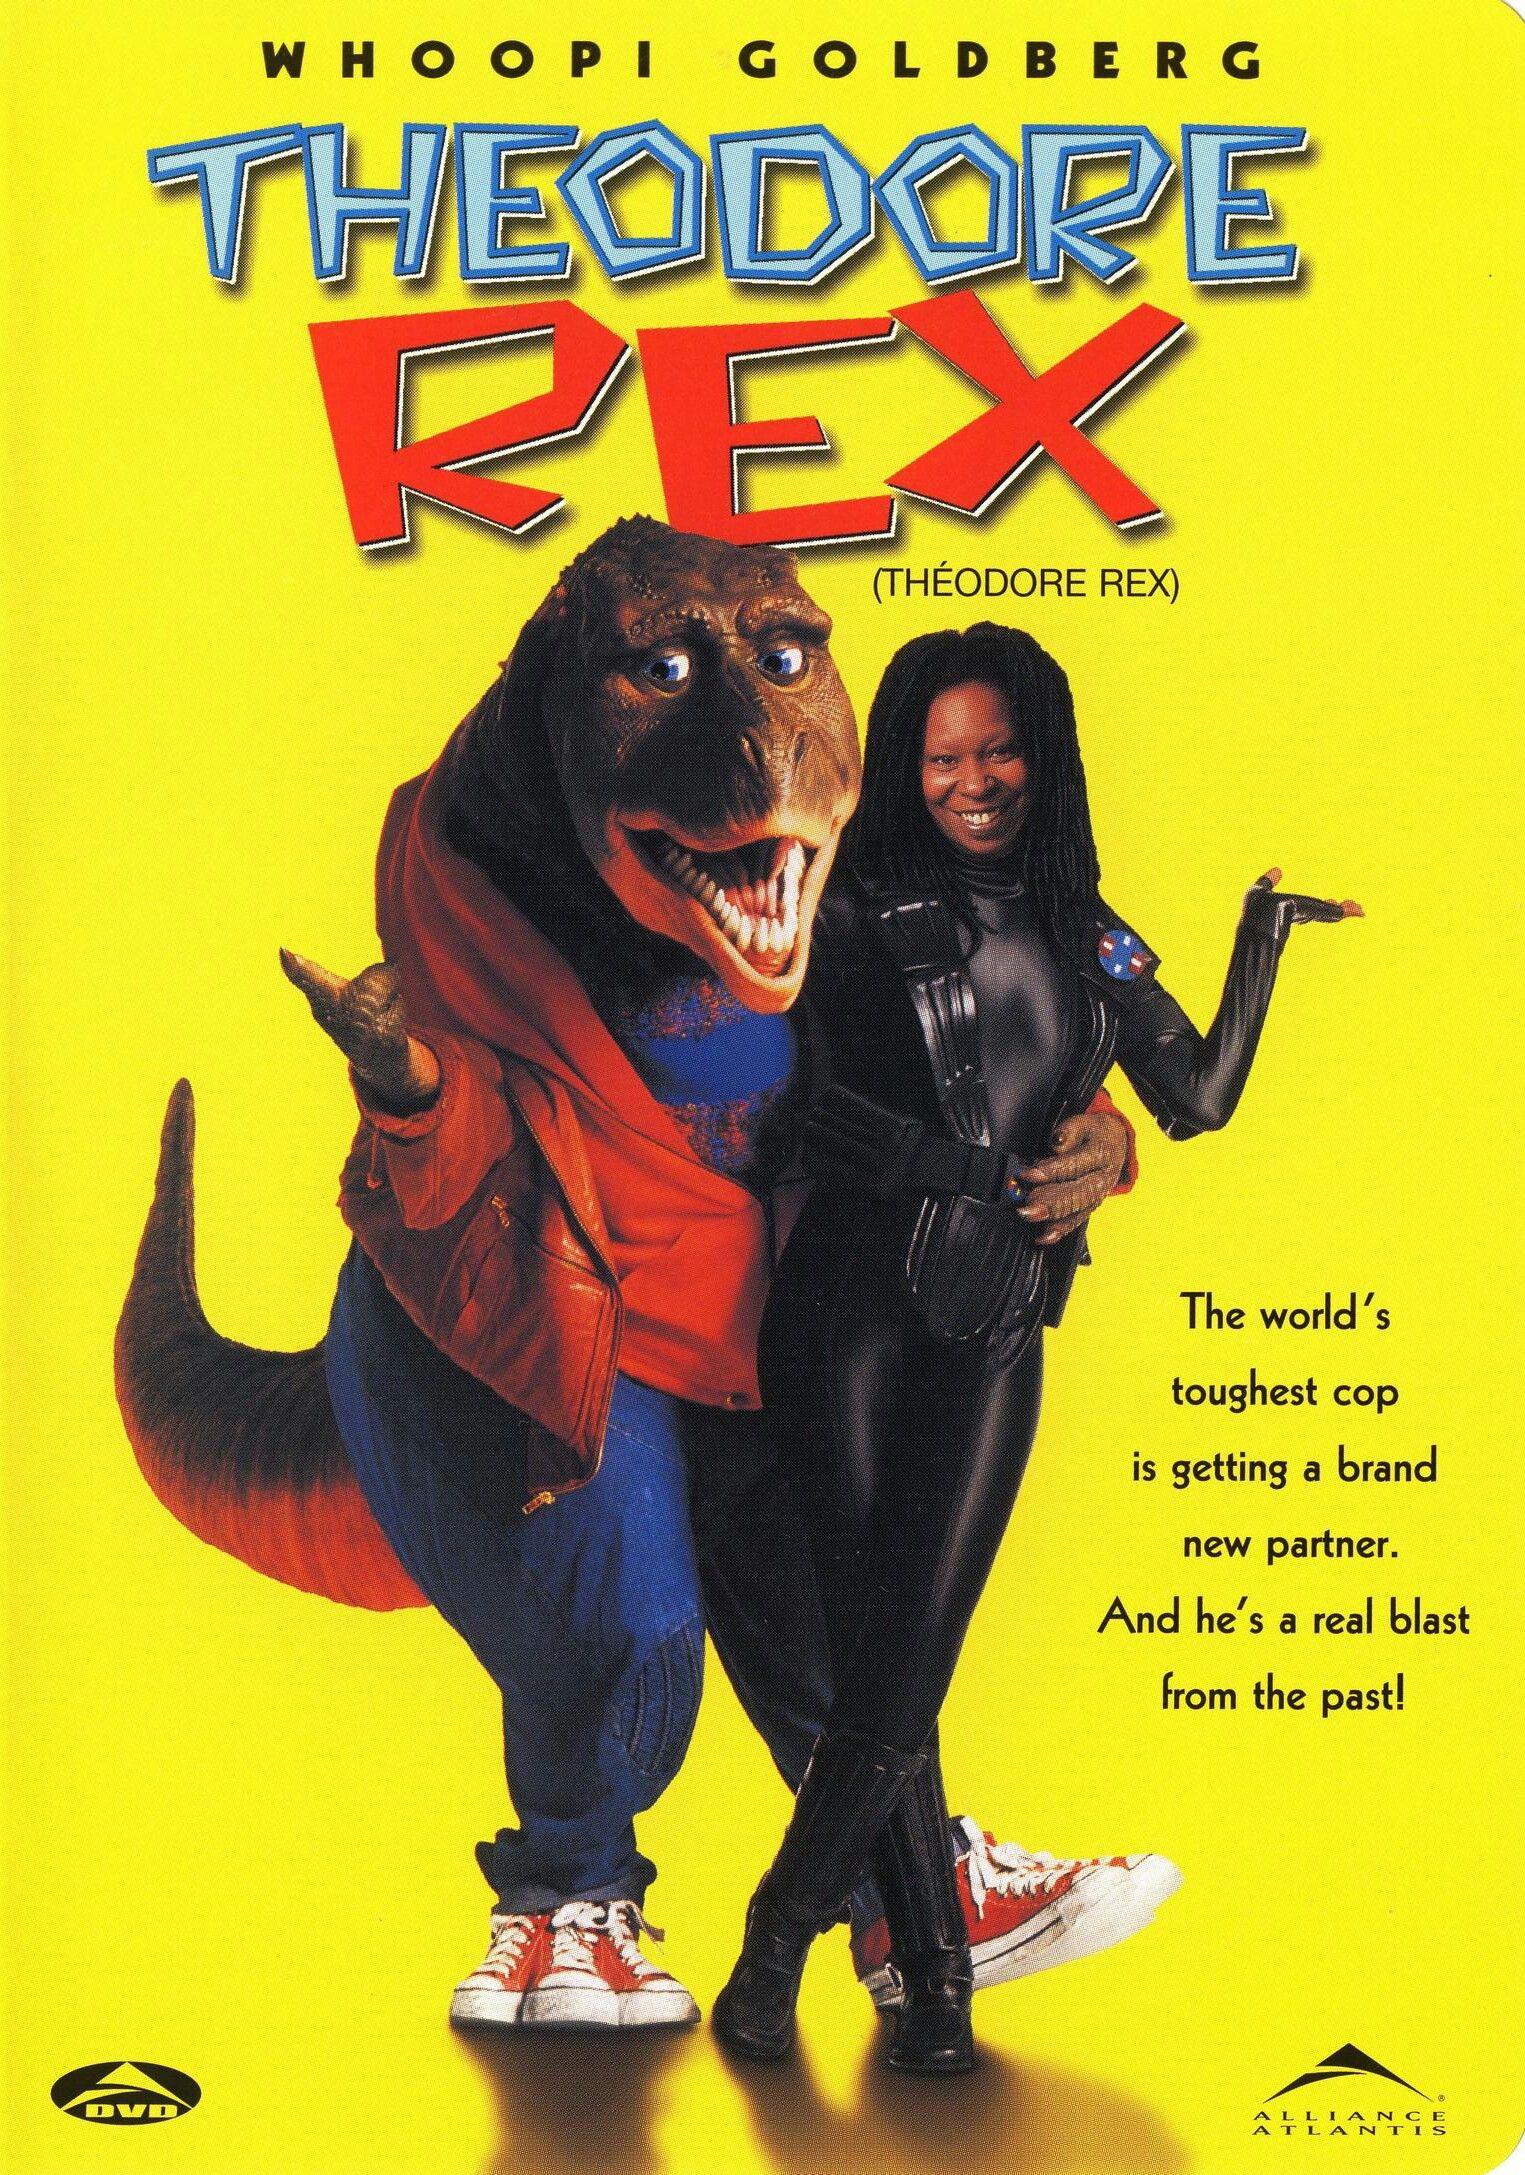 Theodore Rex Movie Tv Hd Movies Streaming Online Whoopi Goldberg